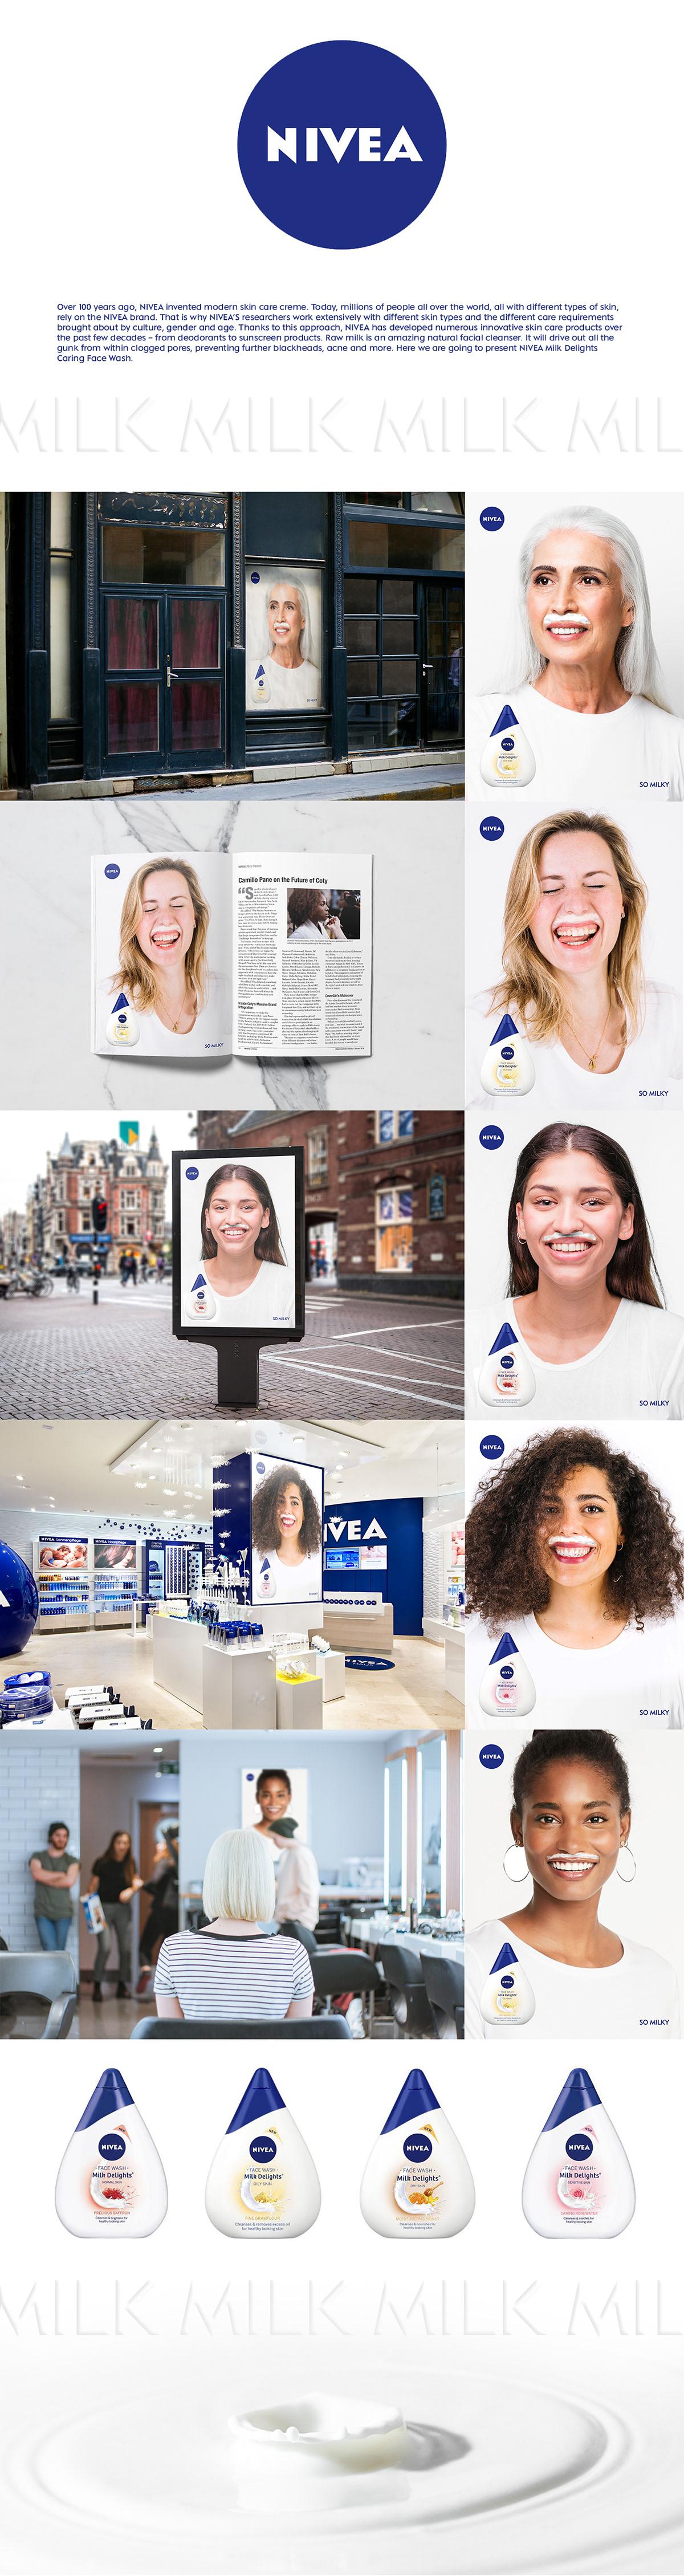 Nivea skin care beauty photograhpy cream creative posters Unilever women art